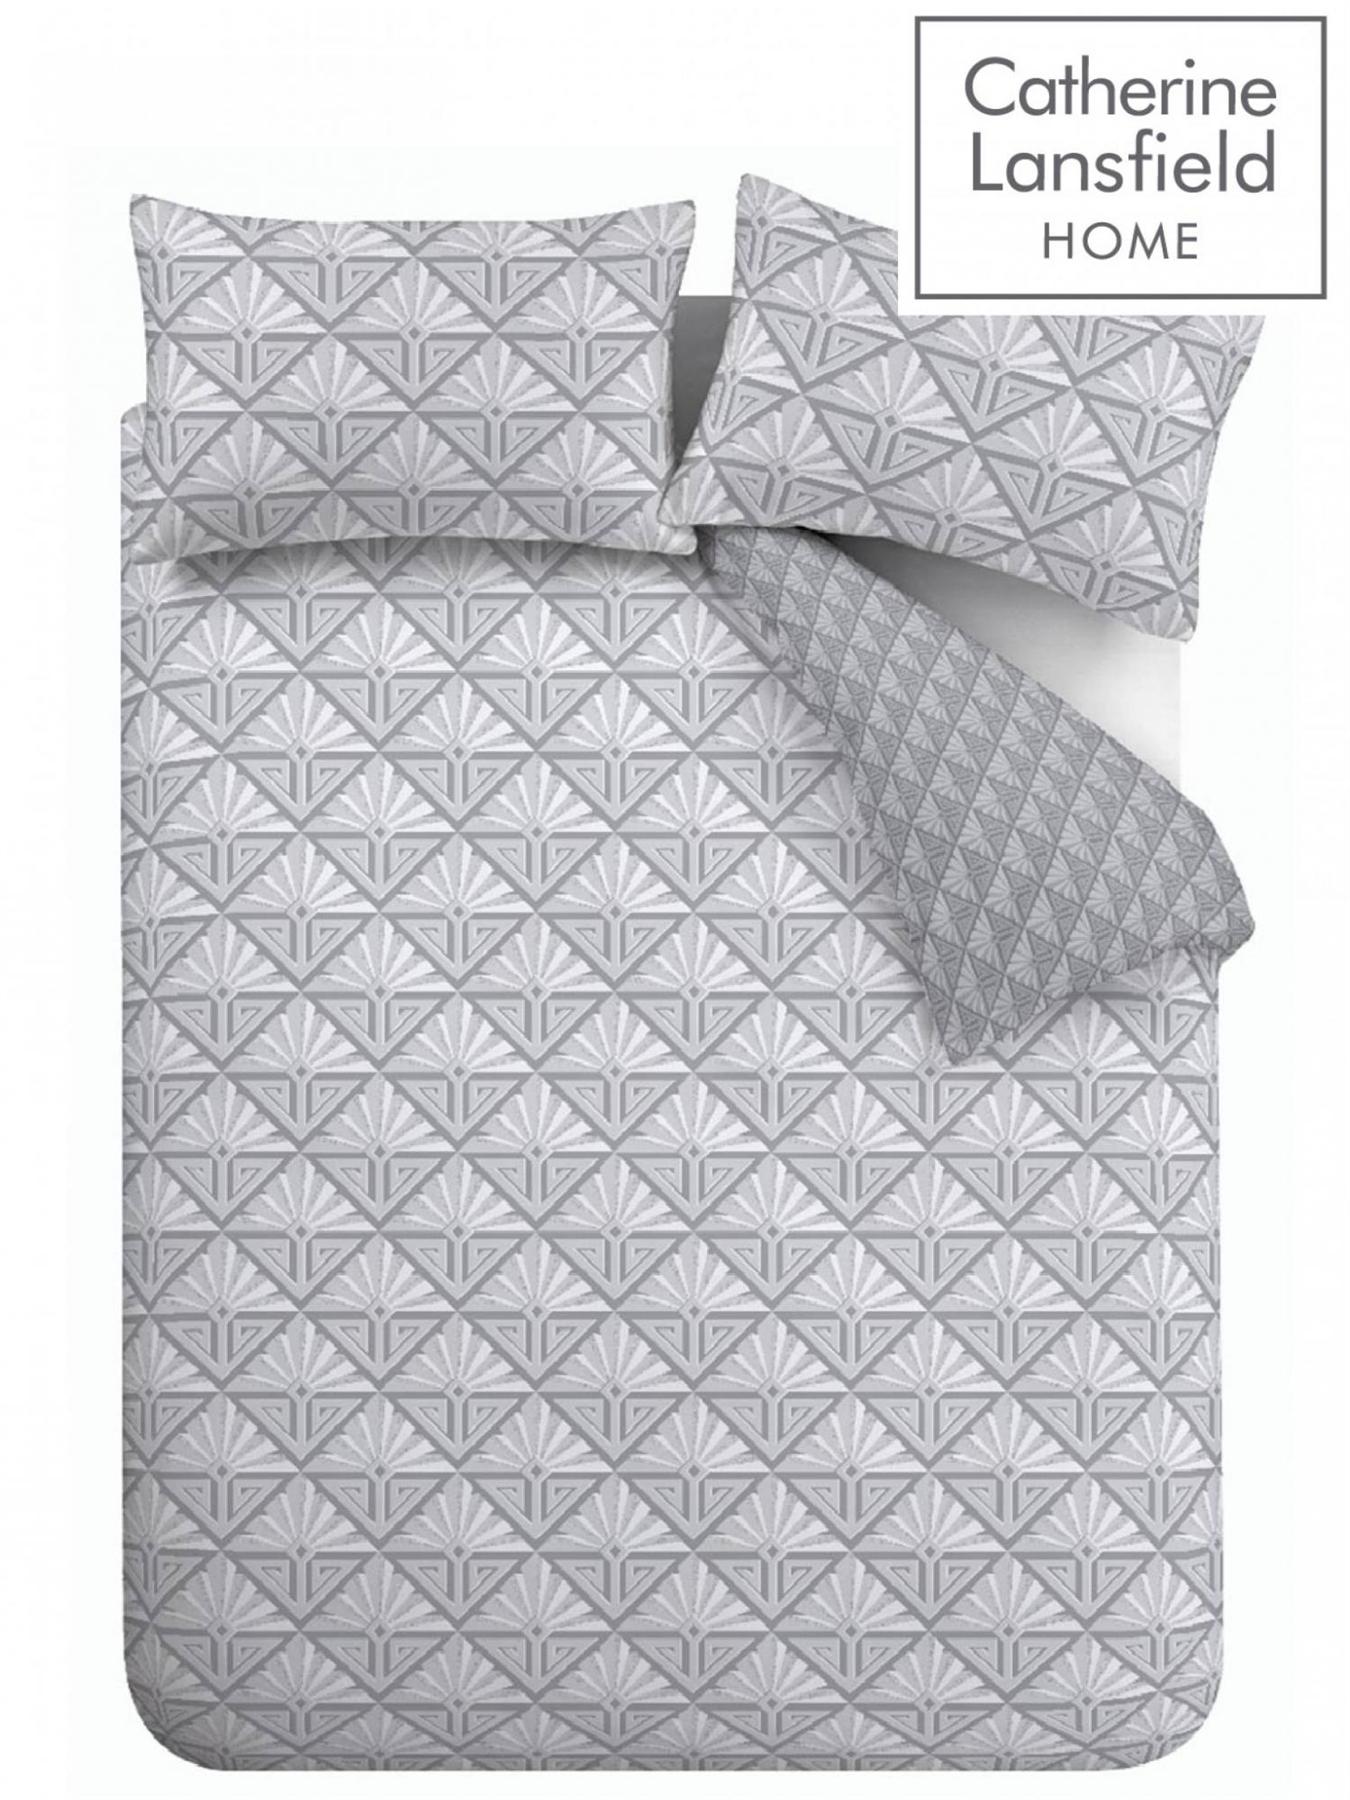 Catherine-Lansfield-Duvet-Set-Reversible-Art-Deco-Grey-Bedding-Pillows-Curtains thumbnail 14